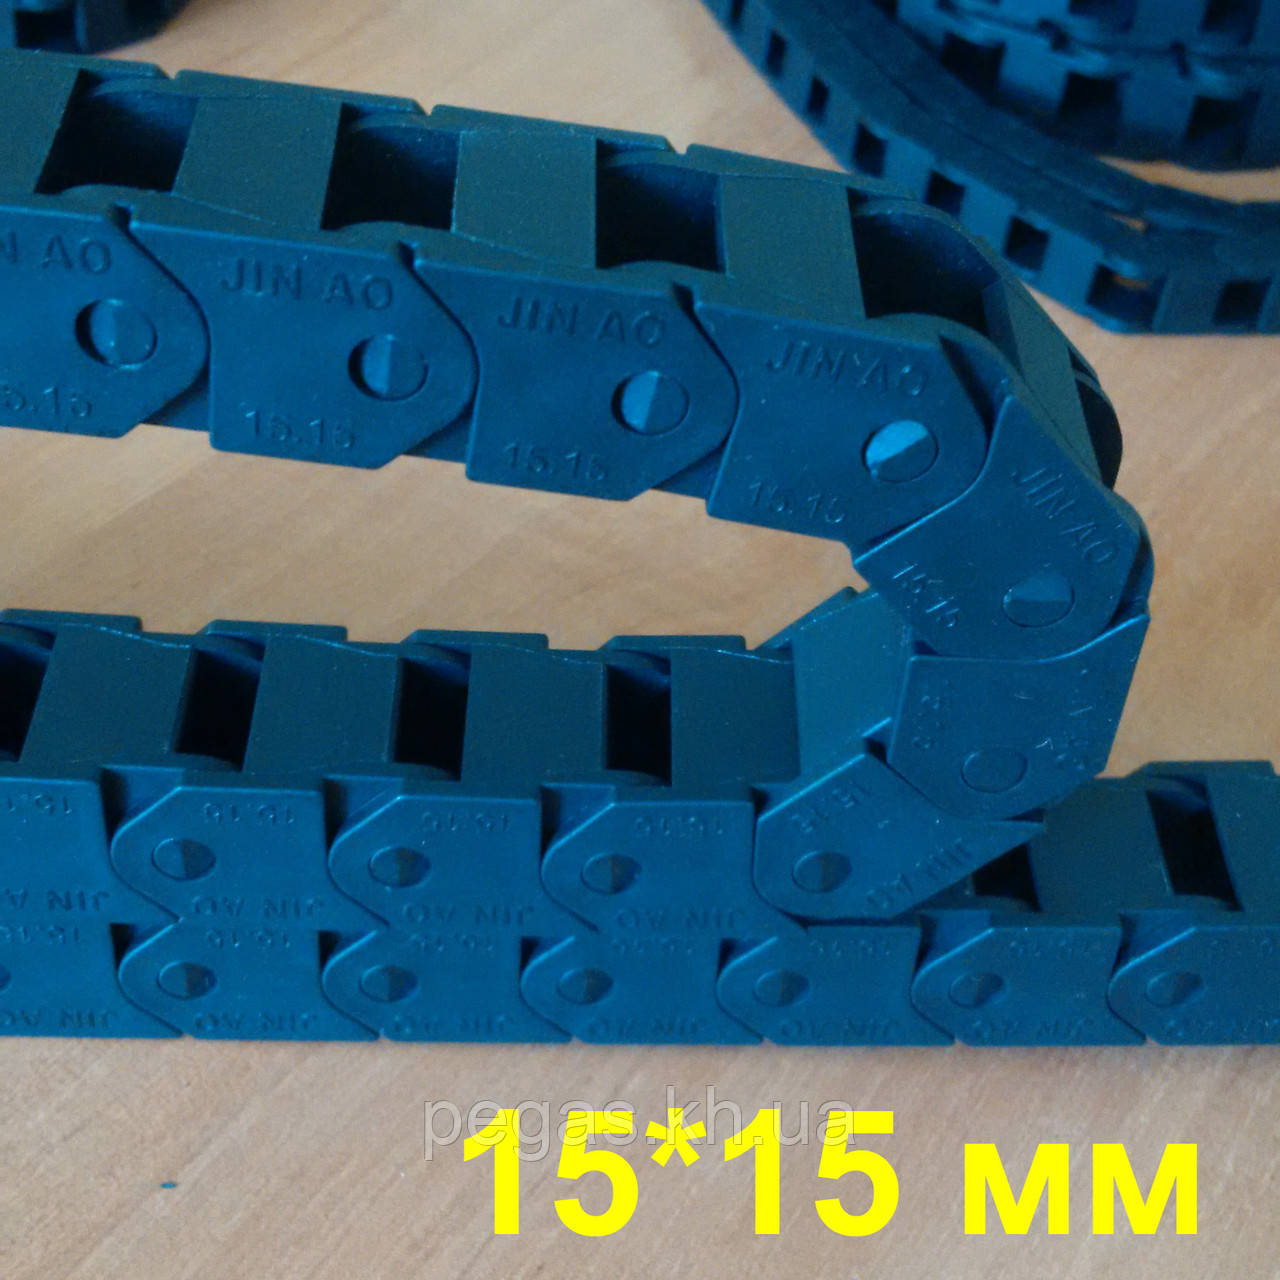 Кабелеукладчик с внутренним размером 15x15мм. Серия MINI